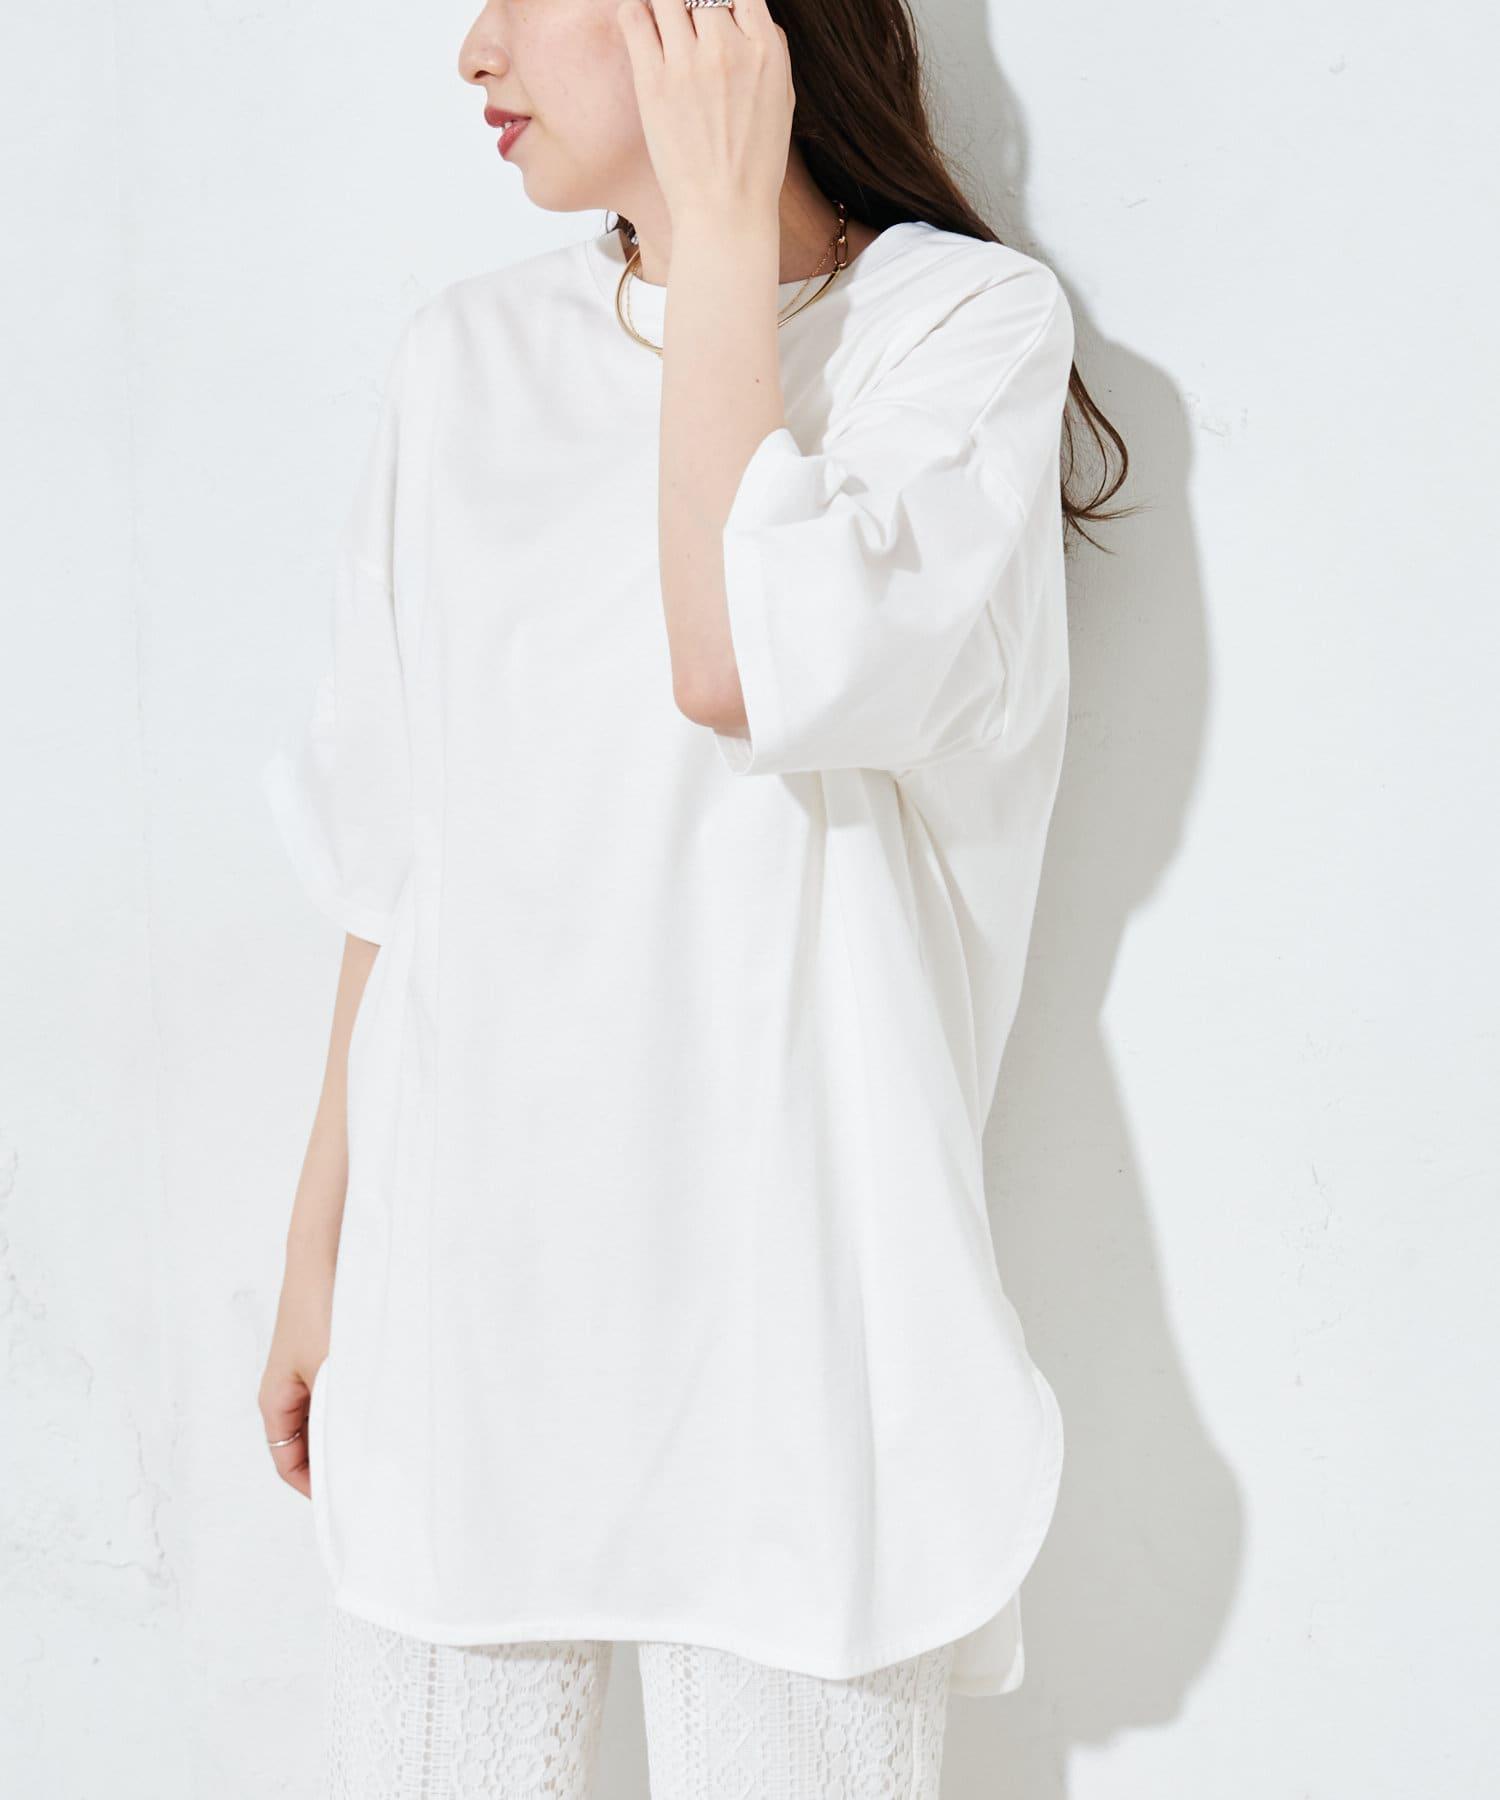 OUTLET(アウトレット) レディース 【Discoat】後ろハギビッグTシャツ オフホワイト